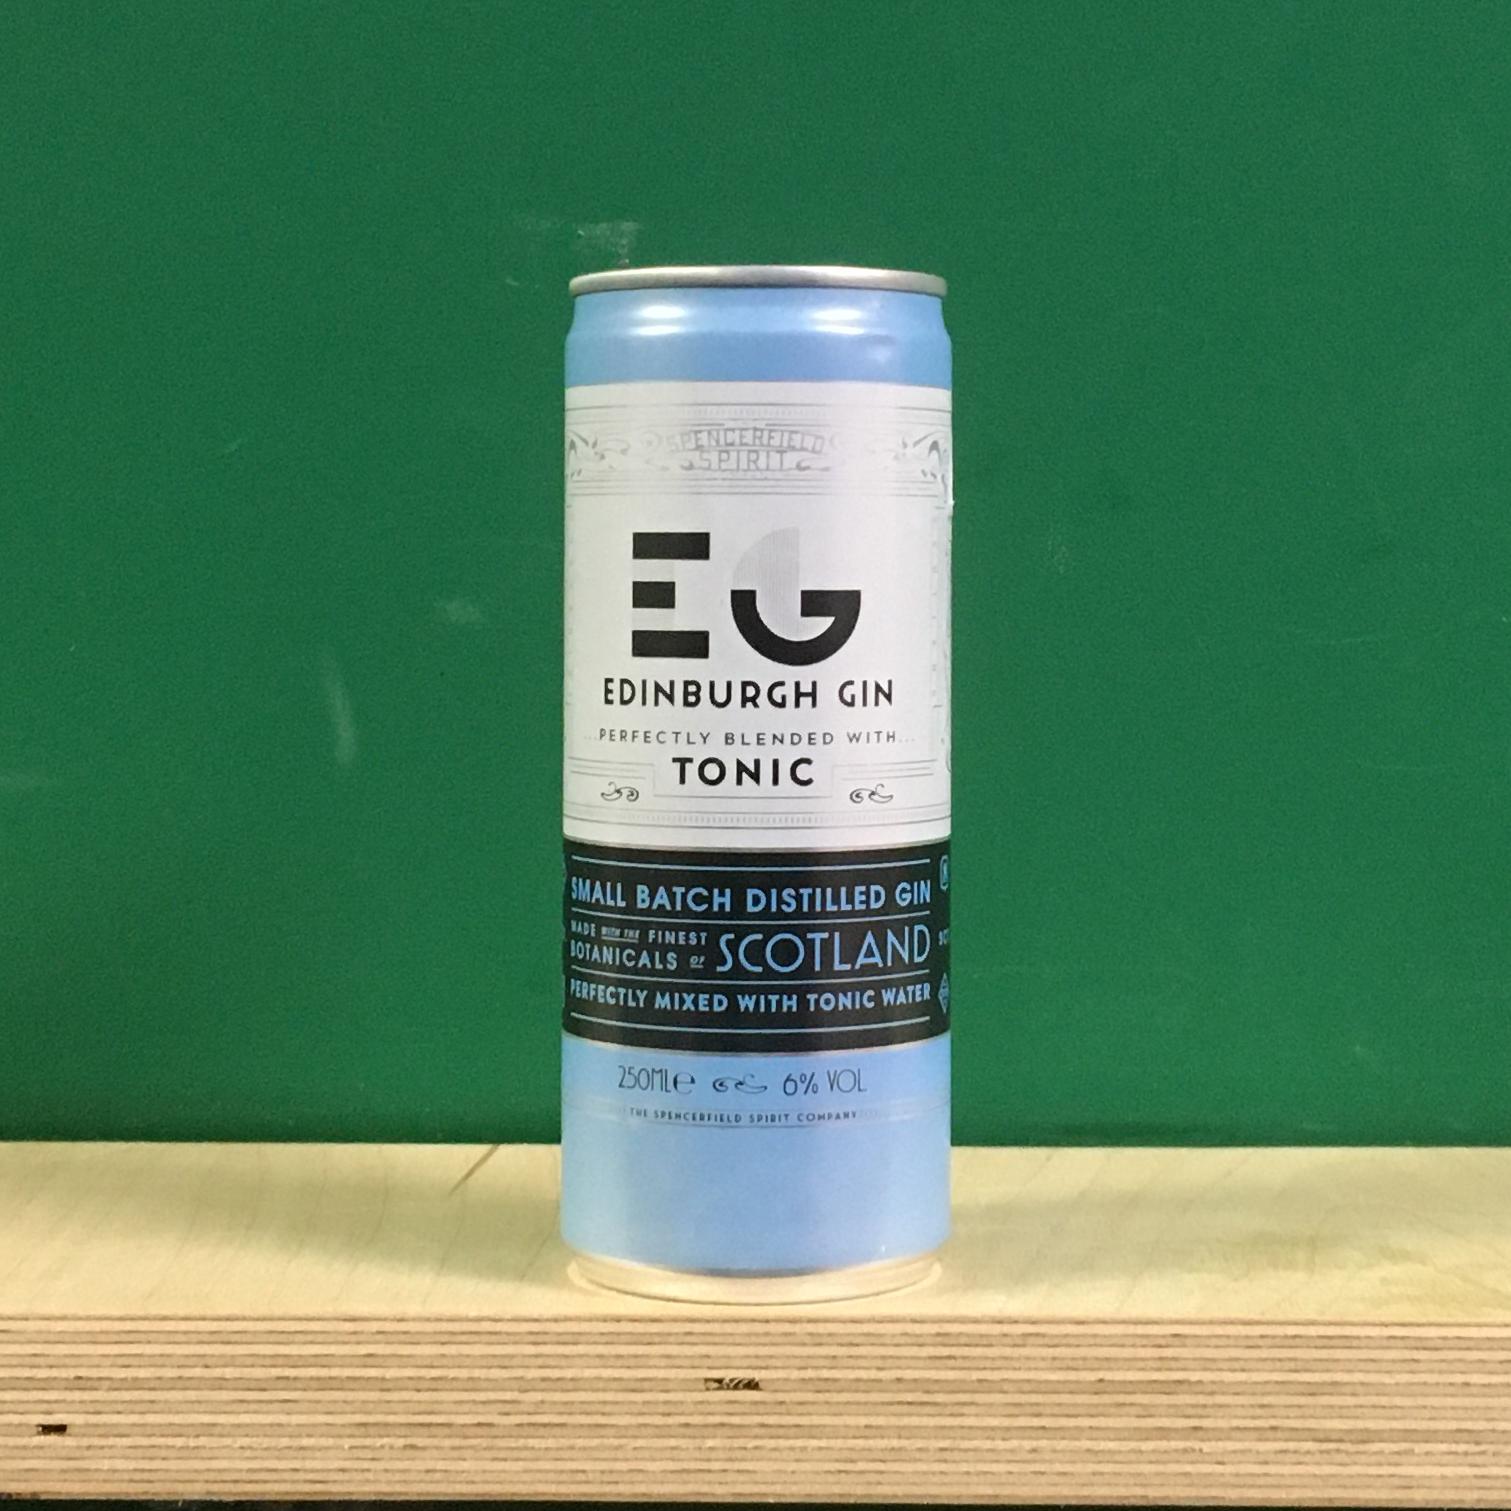 Edinburgh Gin & Tonic - Ready to drink